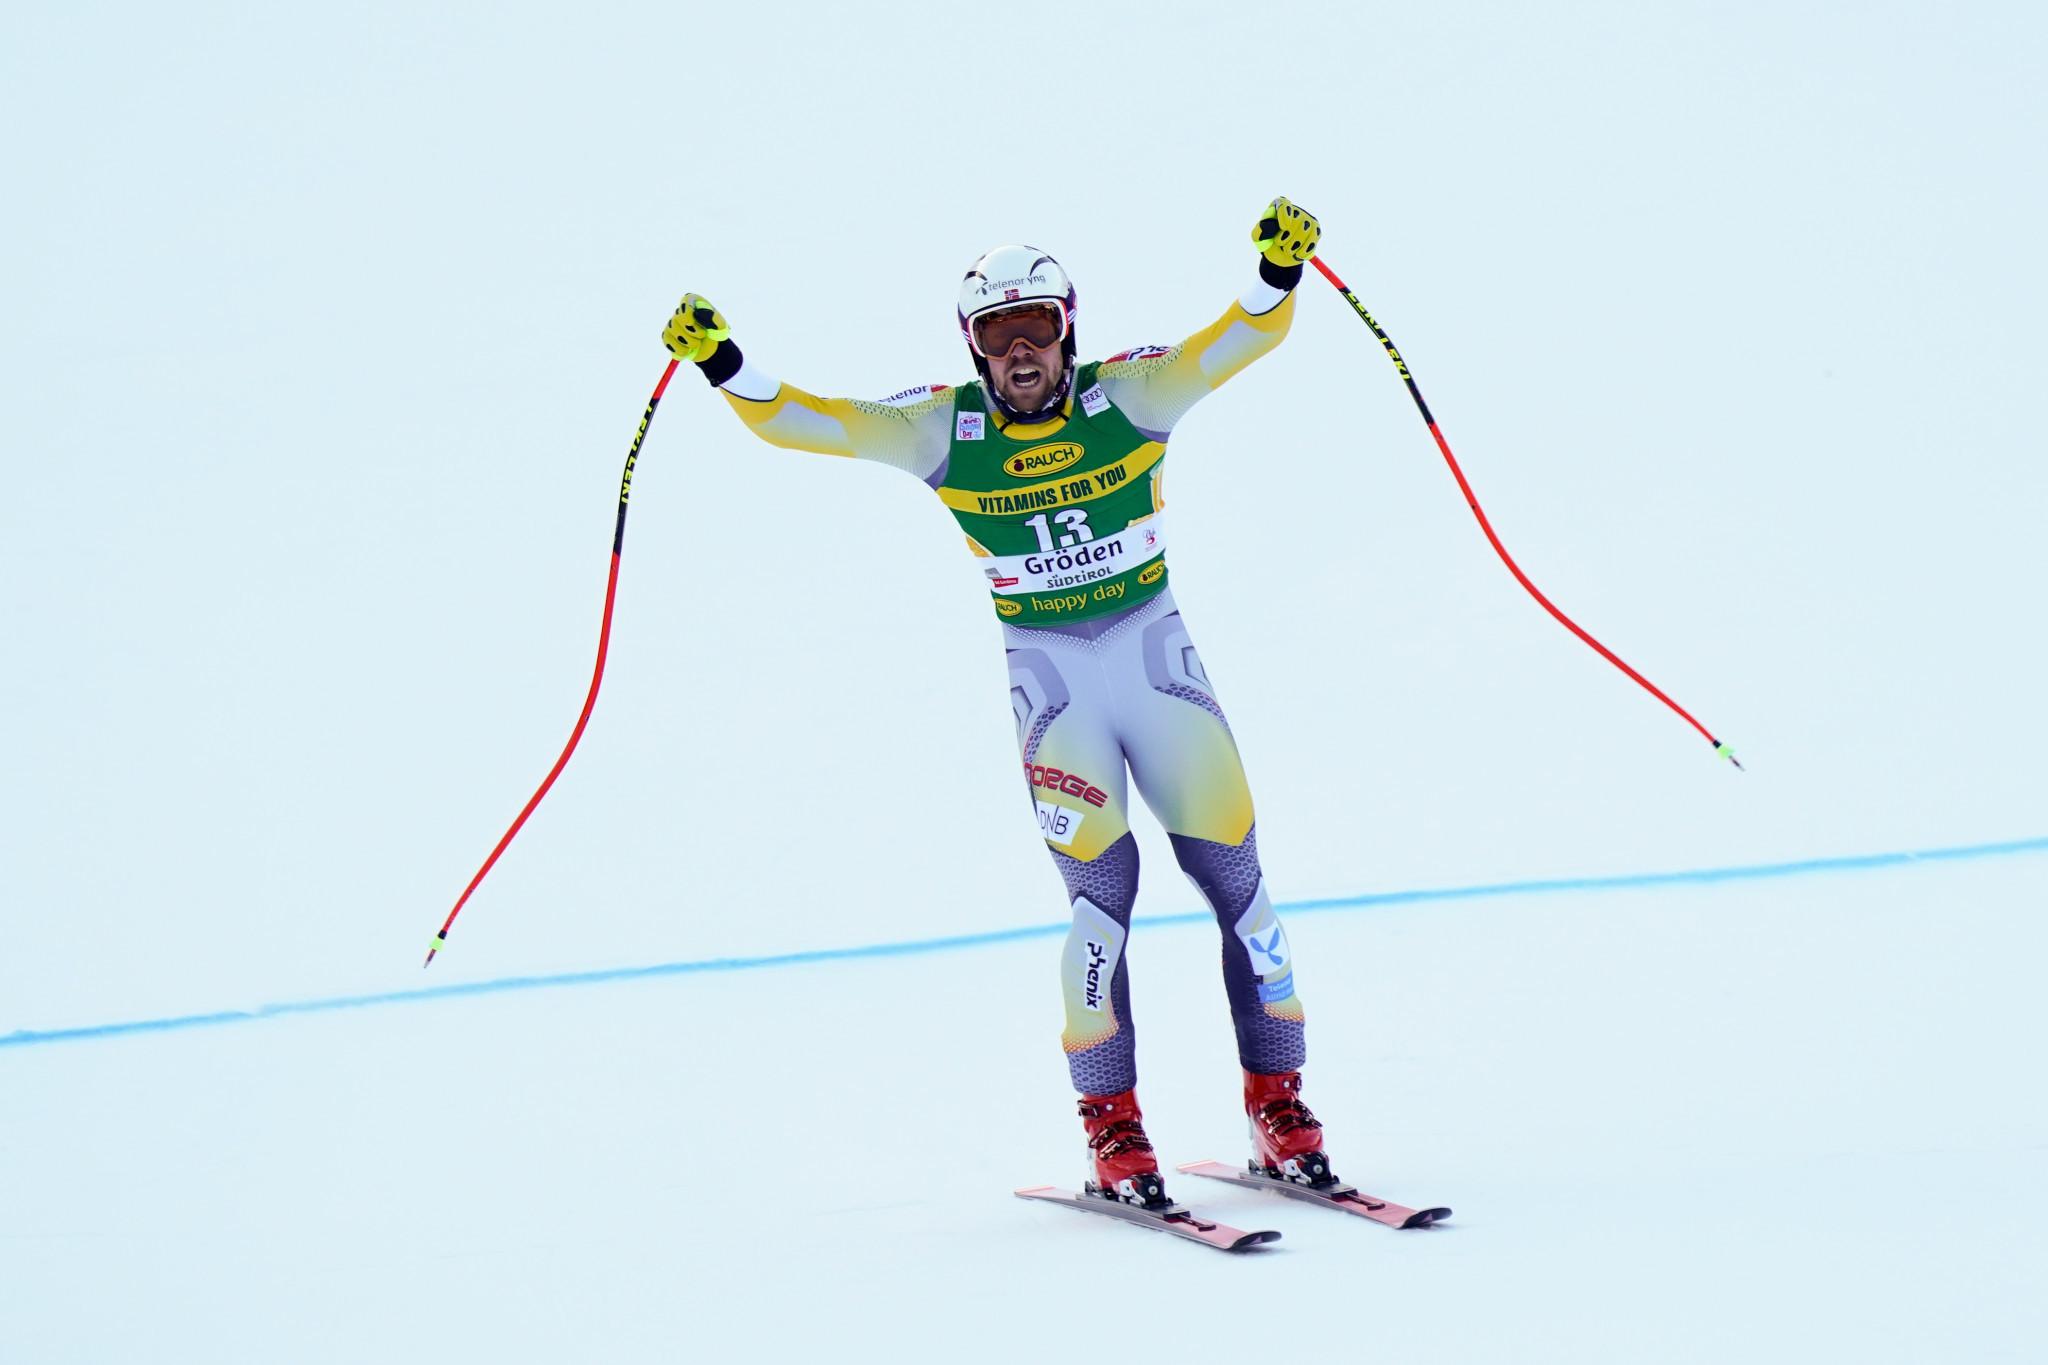 Kilde triumphant in men's super-G at FIS Alpine Ski World Cup in Val Gardena